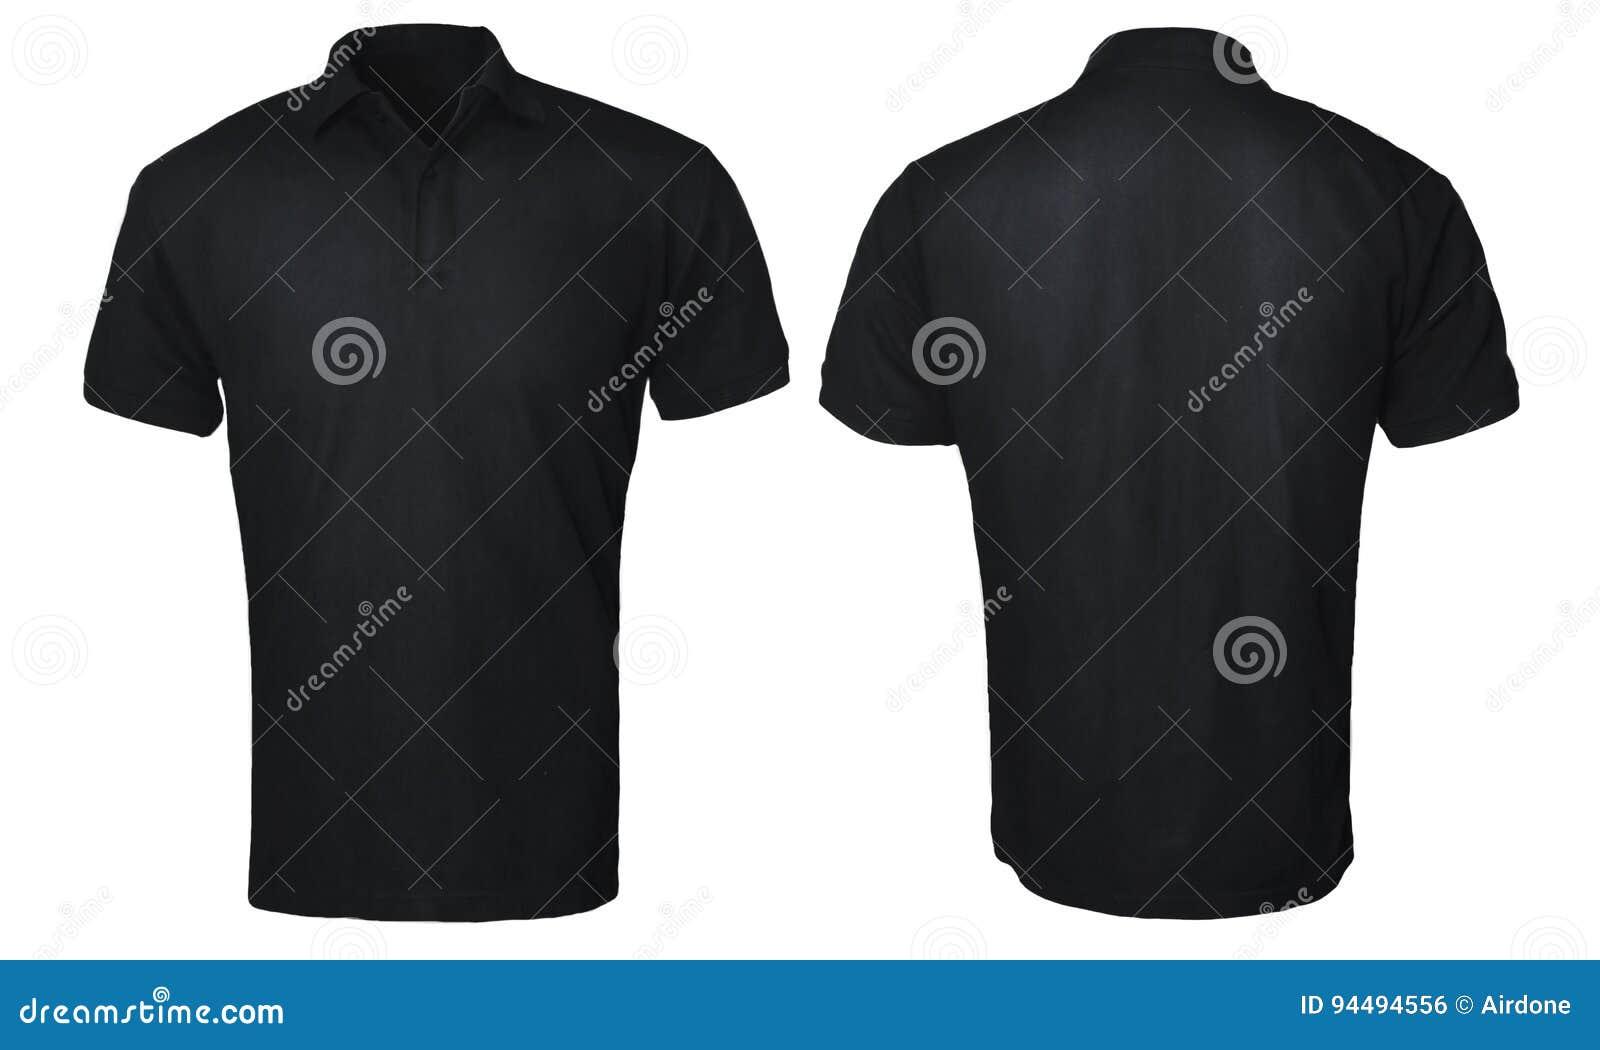 Black t shirt front and back plain - Black Polo Shirt Mock Up Royalty Free Stock Image